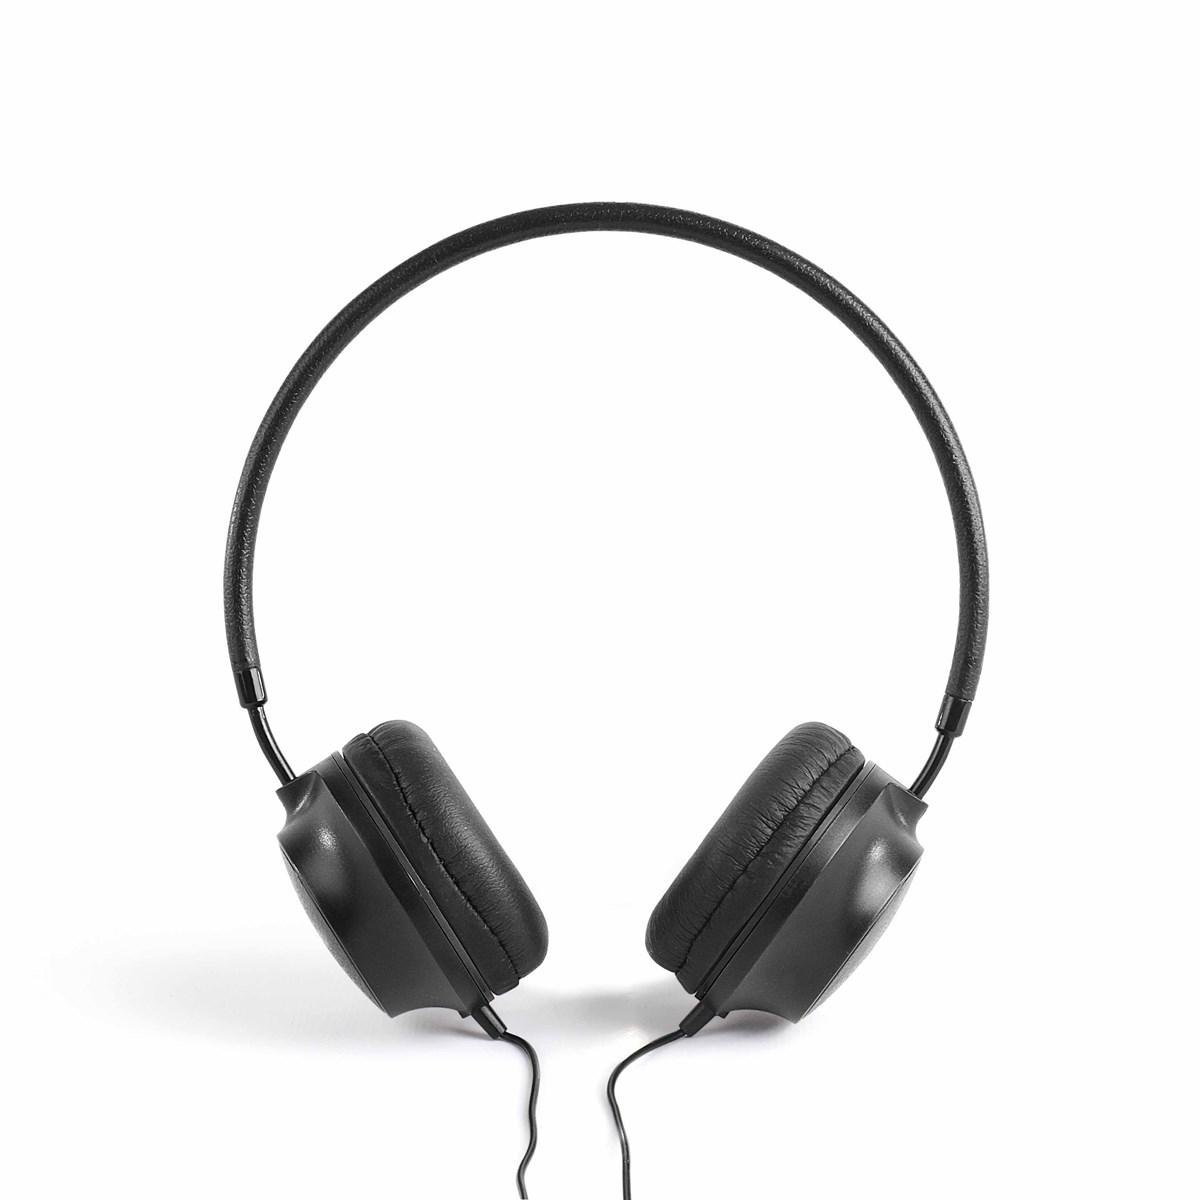 Livoo Casque stereo Hi-Fi en Plastique Noir